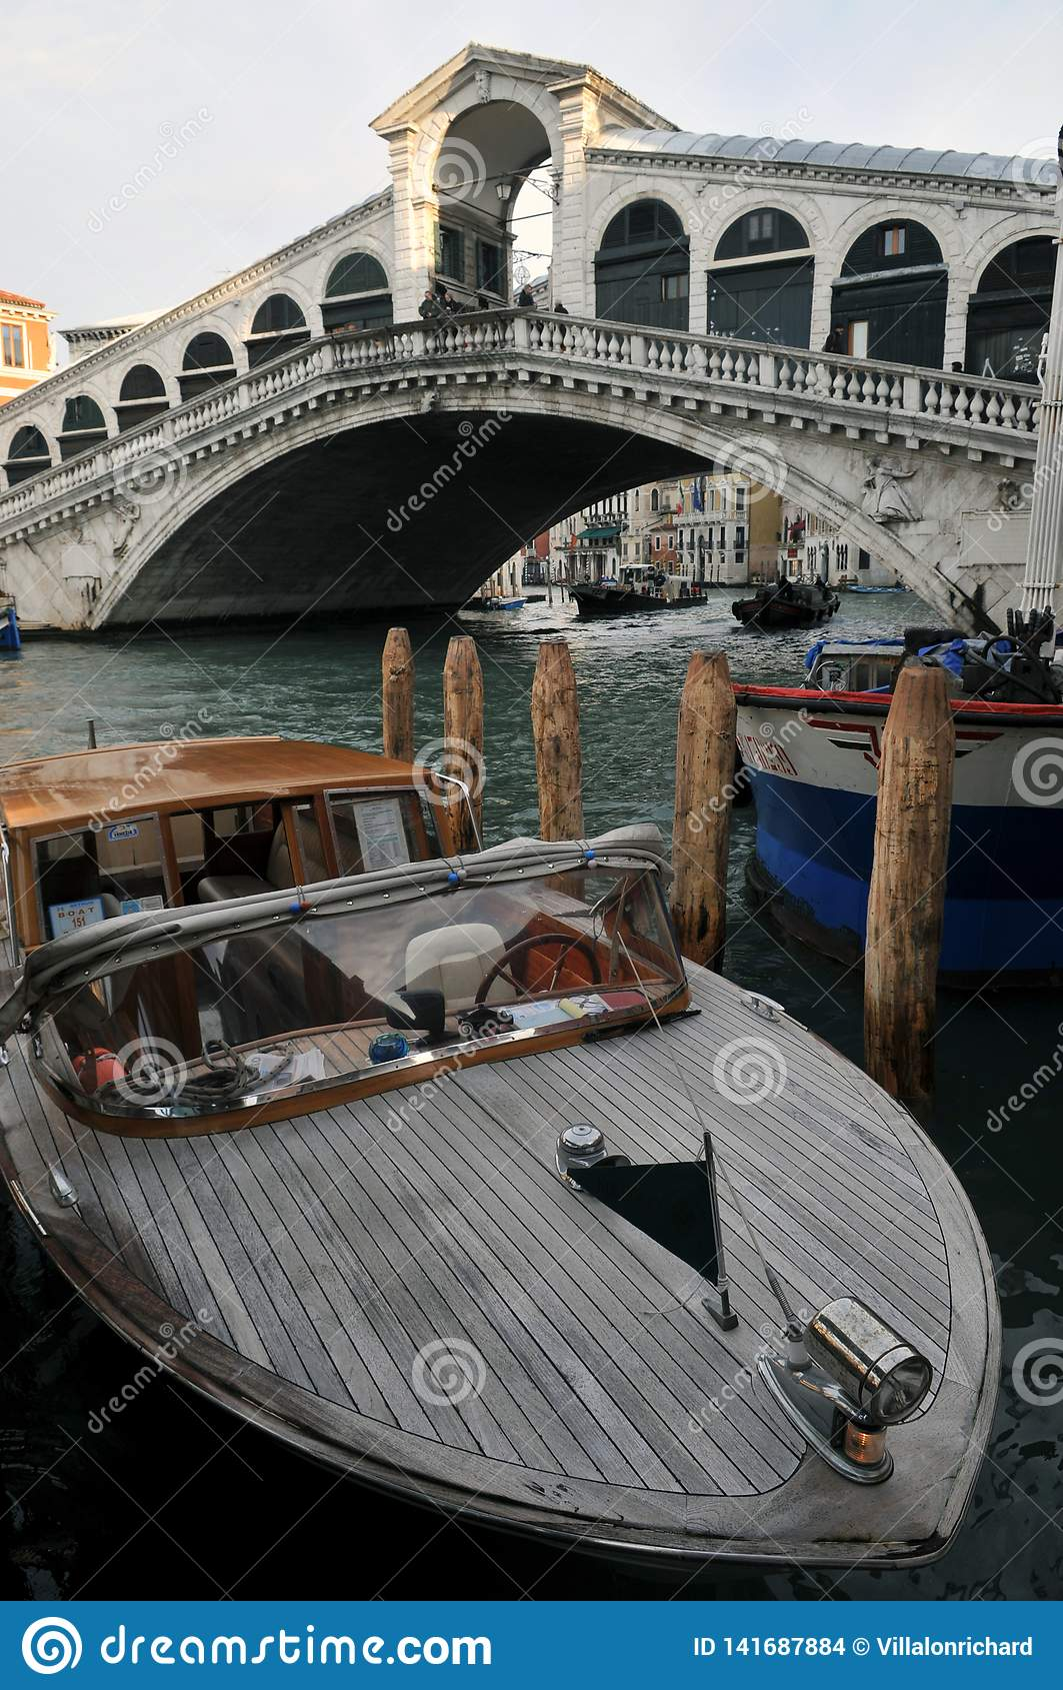 De Rialto-Brug in Venetië, Italië